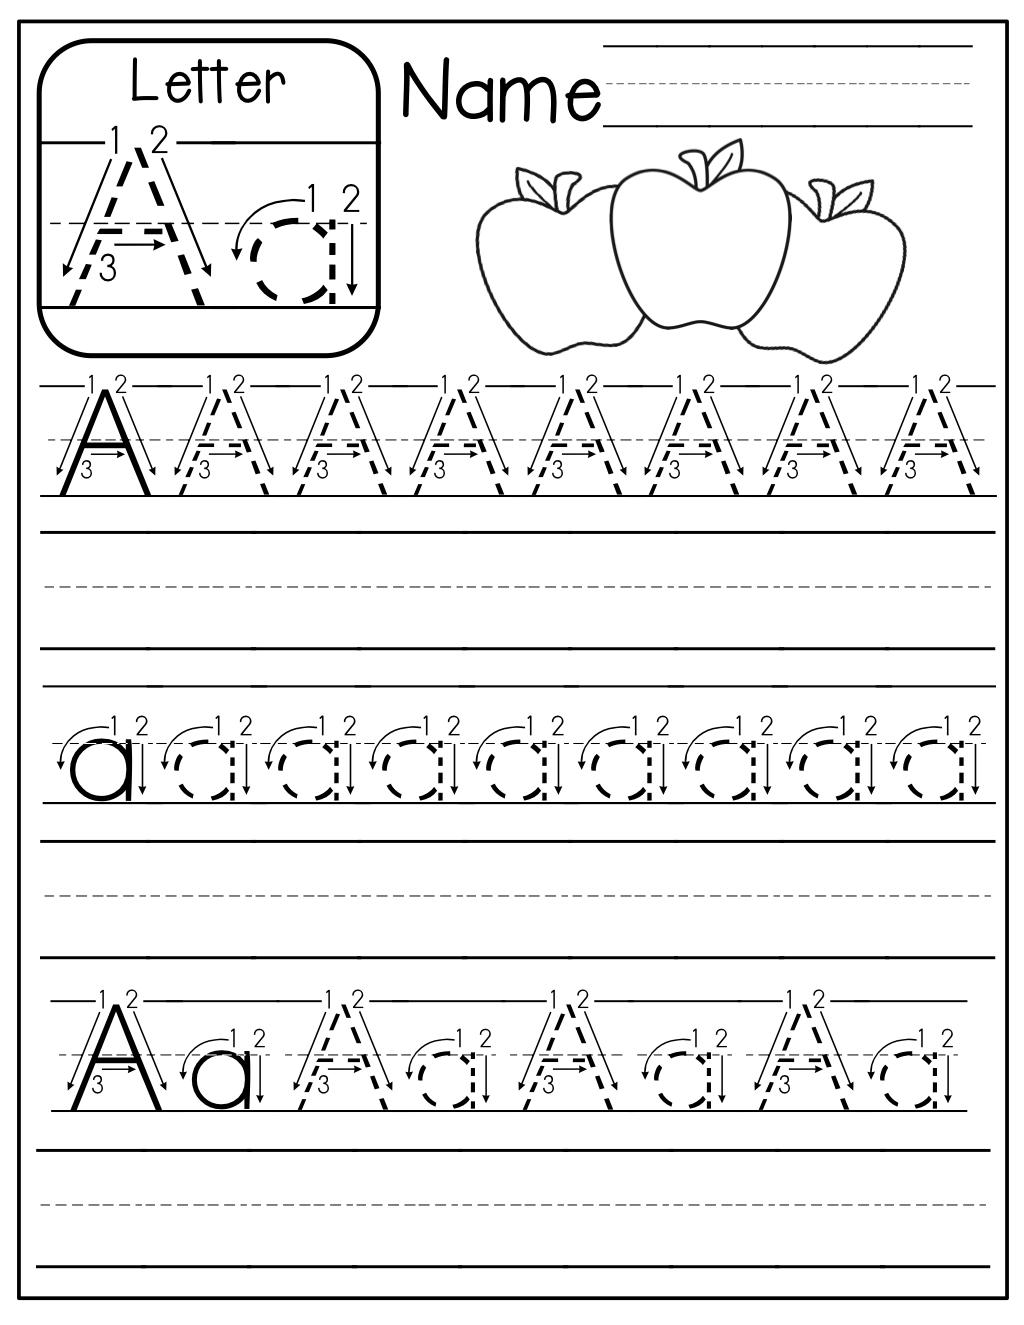 Freebie: A-Z Handwriting Practice Pages! | Kindergarten pertaining to Pre-K Alphabet Handwriting Worksheets